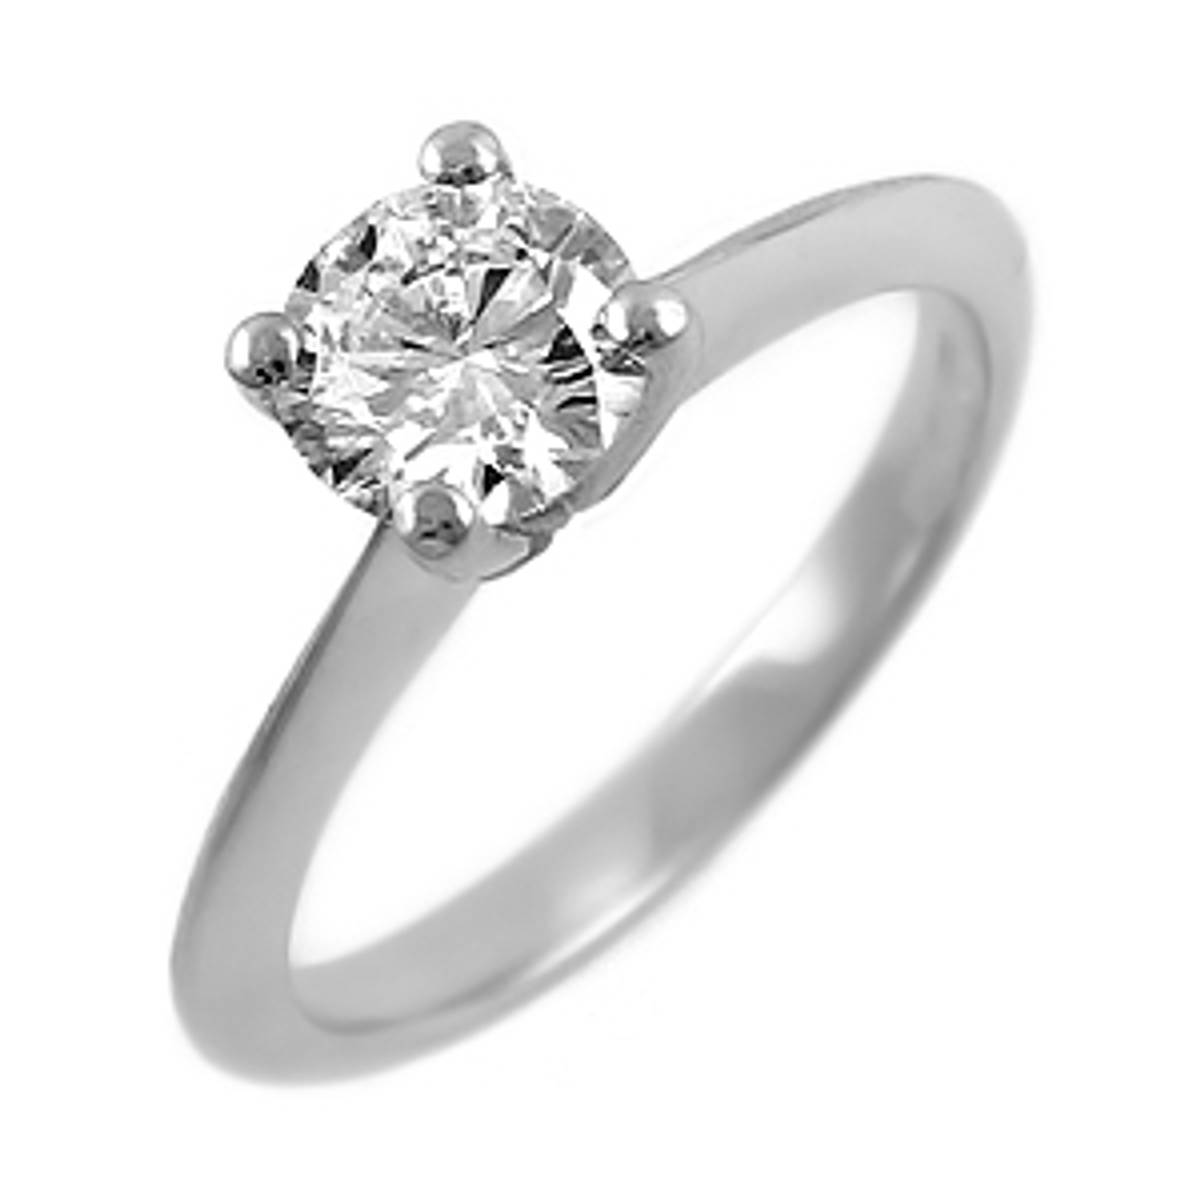 Irish made 0.41ct brilliant cut diamond ring set in 18ct white gold.